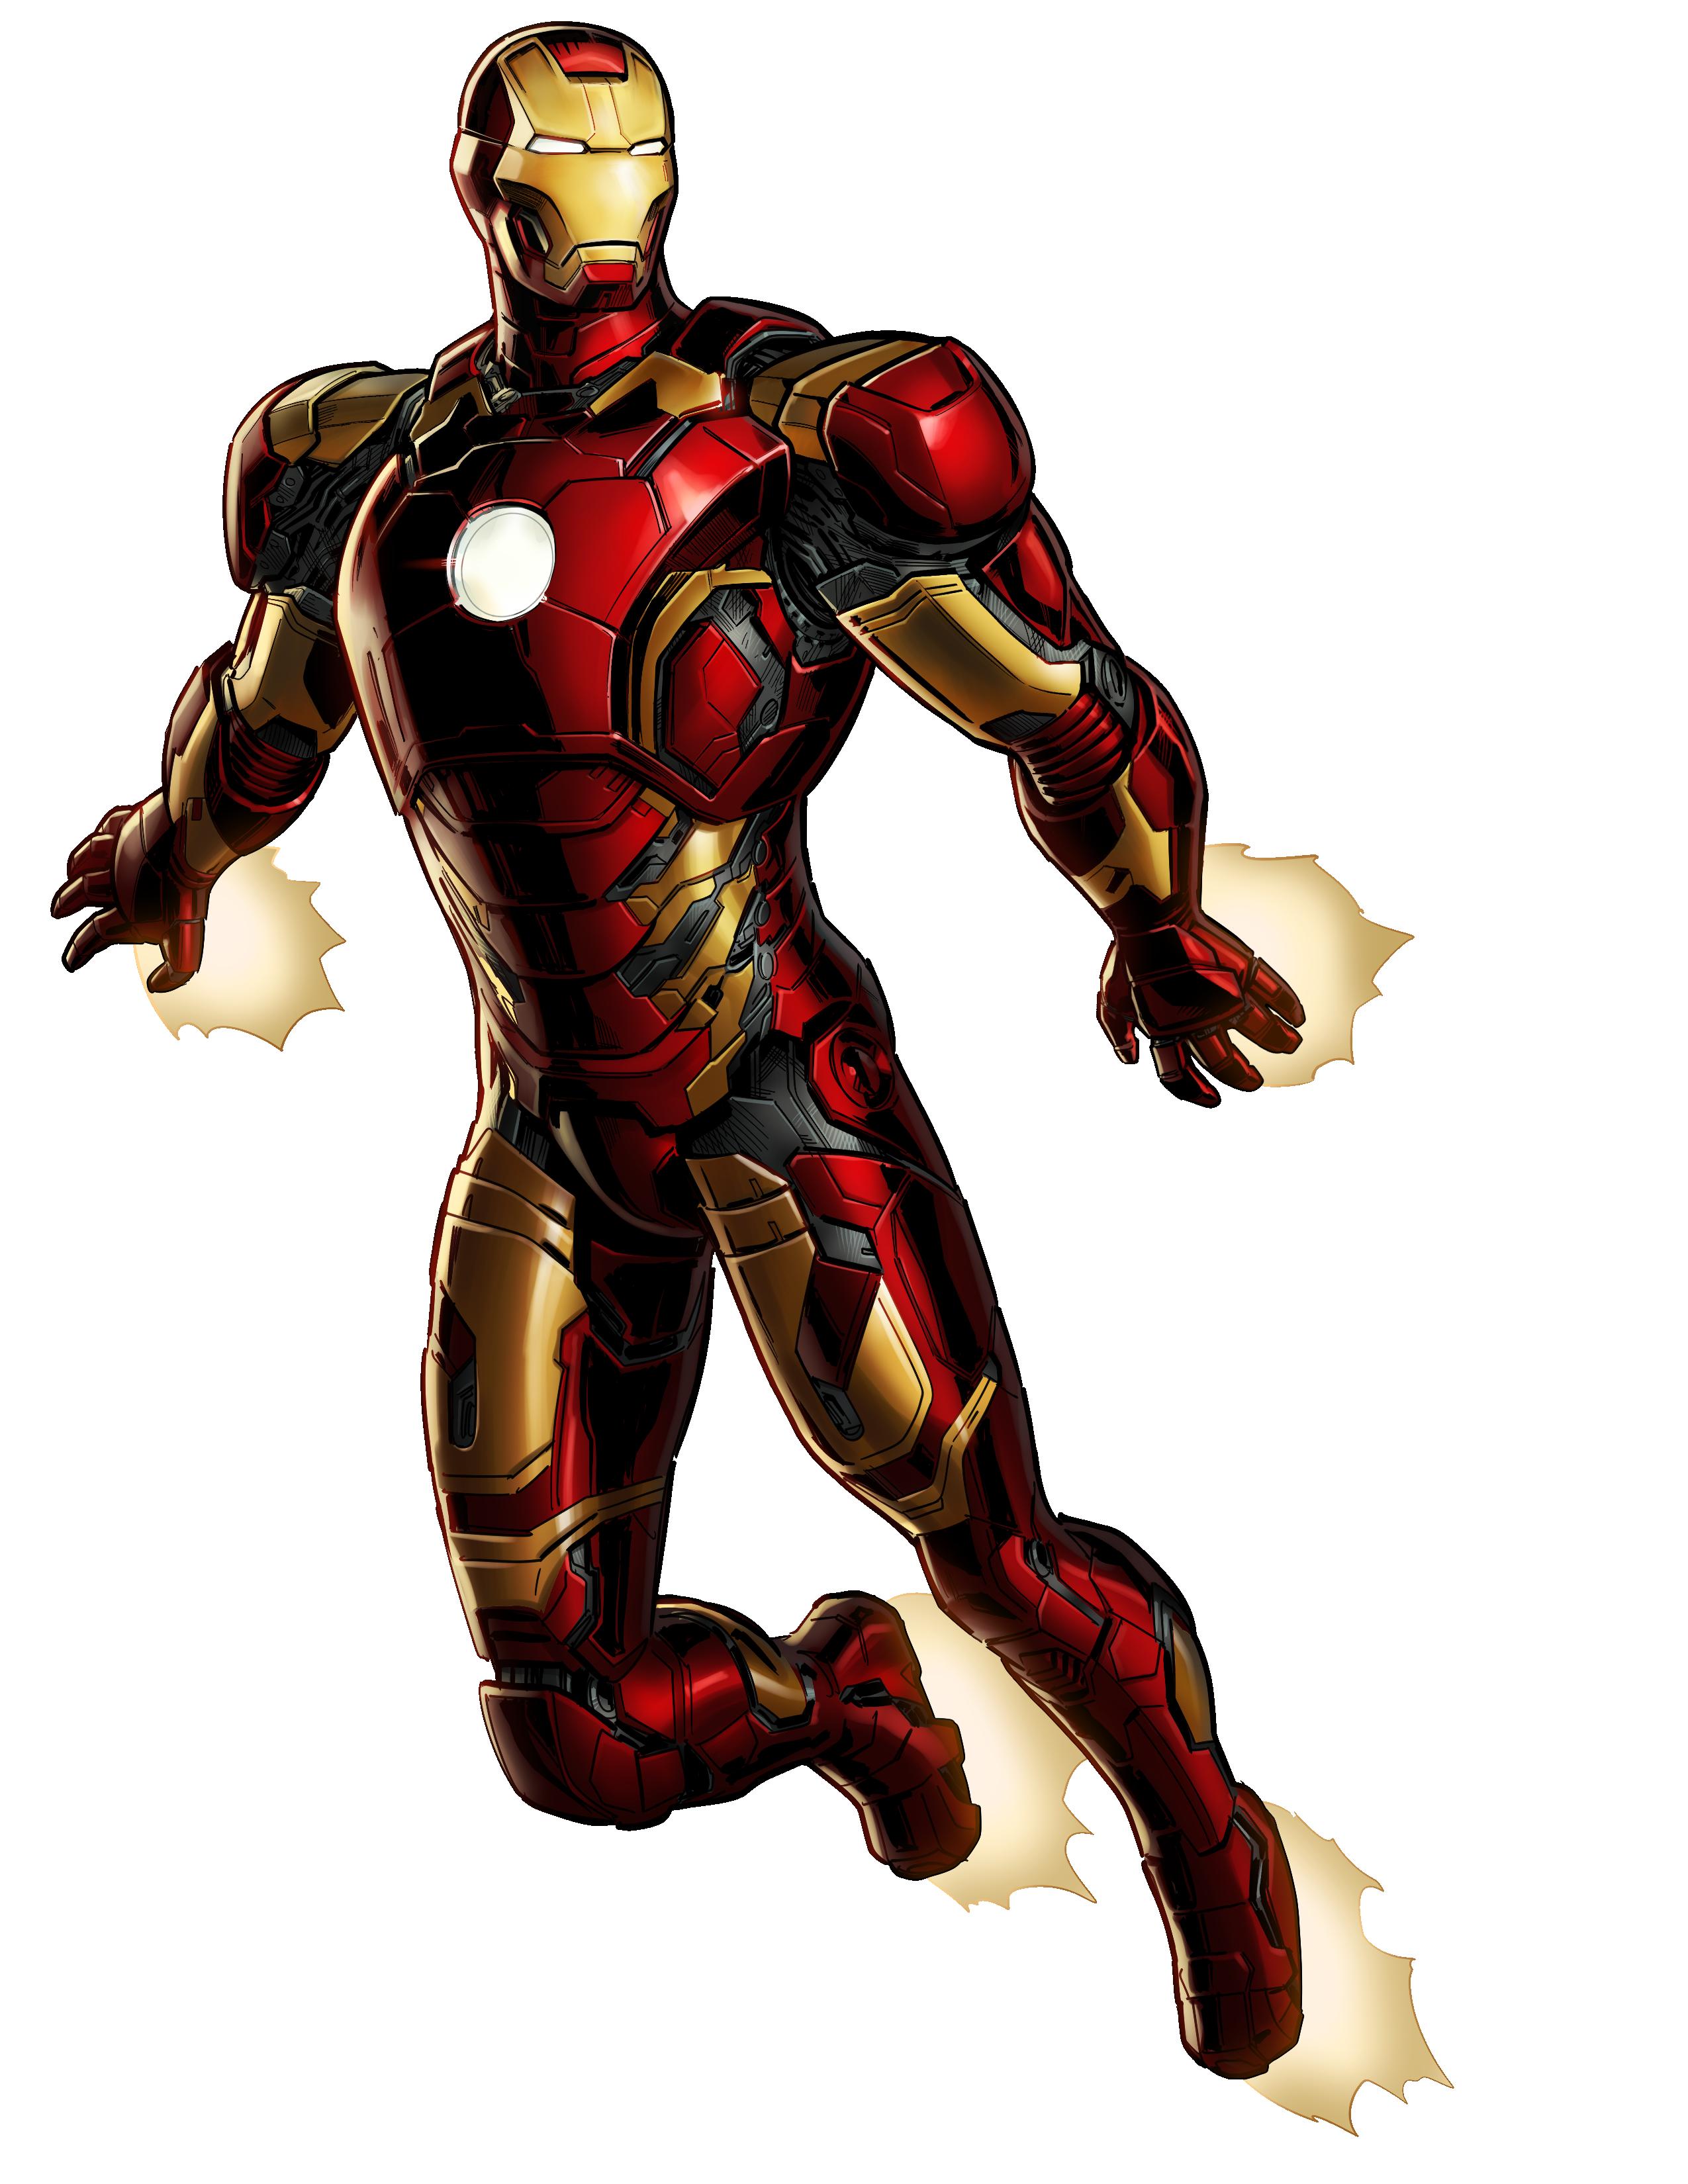 Pin By Jtatuem98 On Marvel Pinterest Iron Man And Vs Capcom Infinite Reg 3 Avengers Alliance Comics Drawing Characters